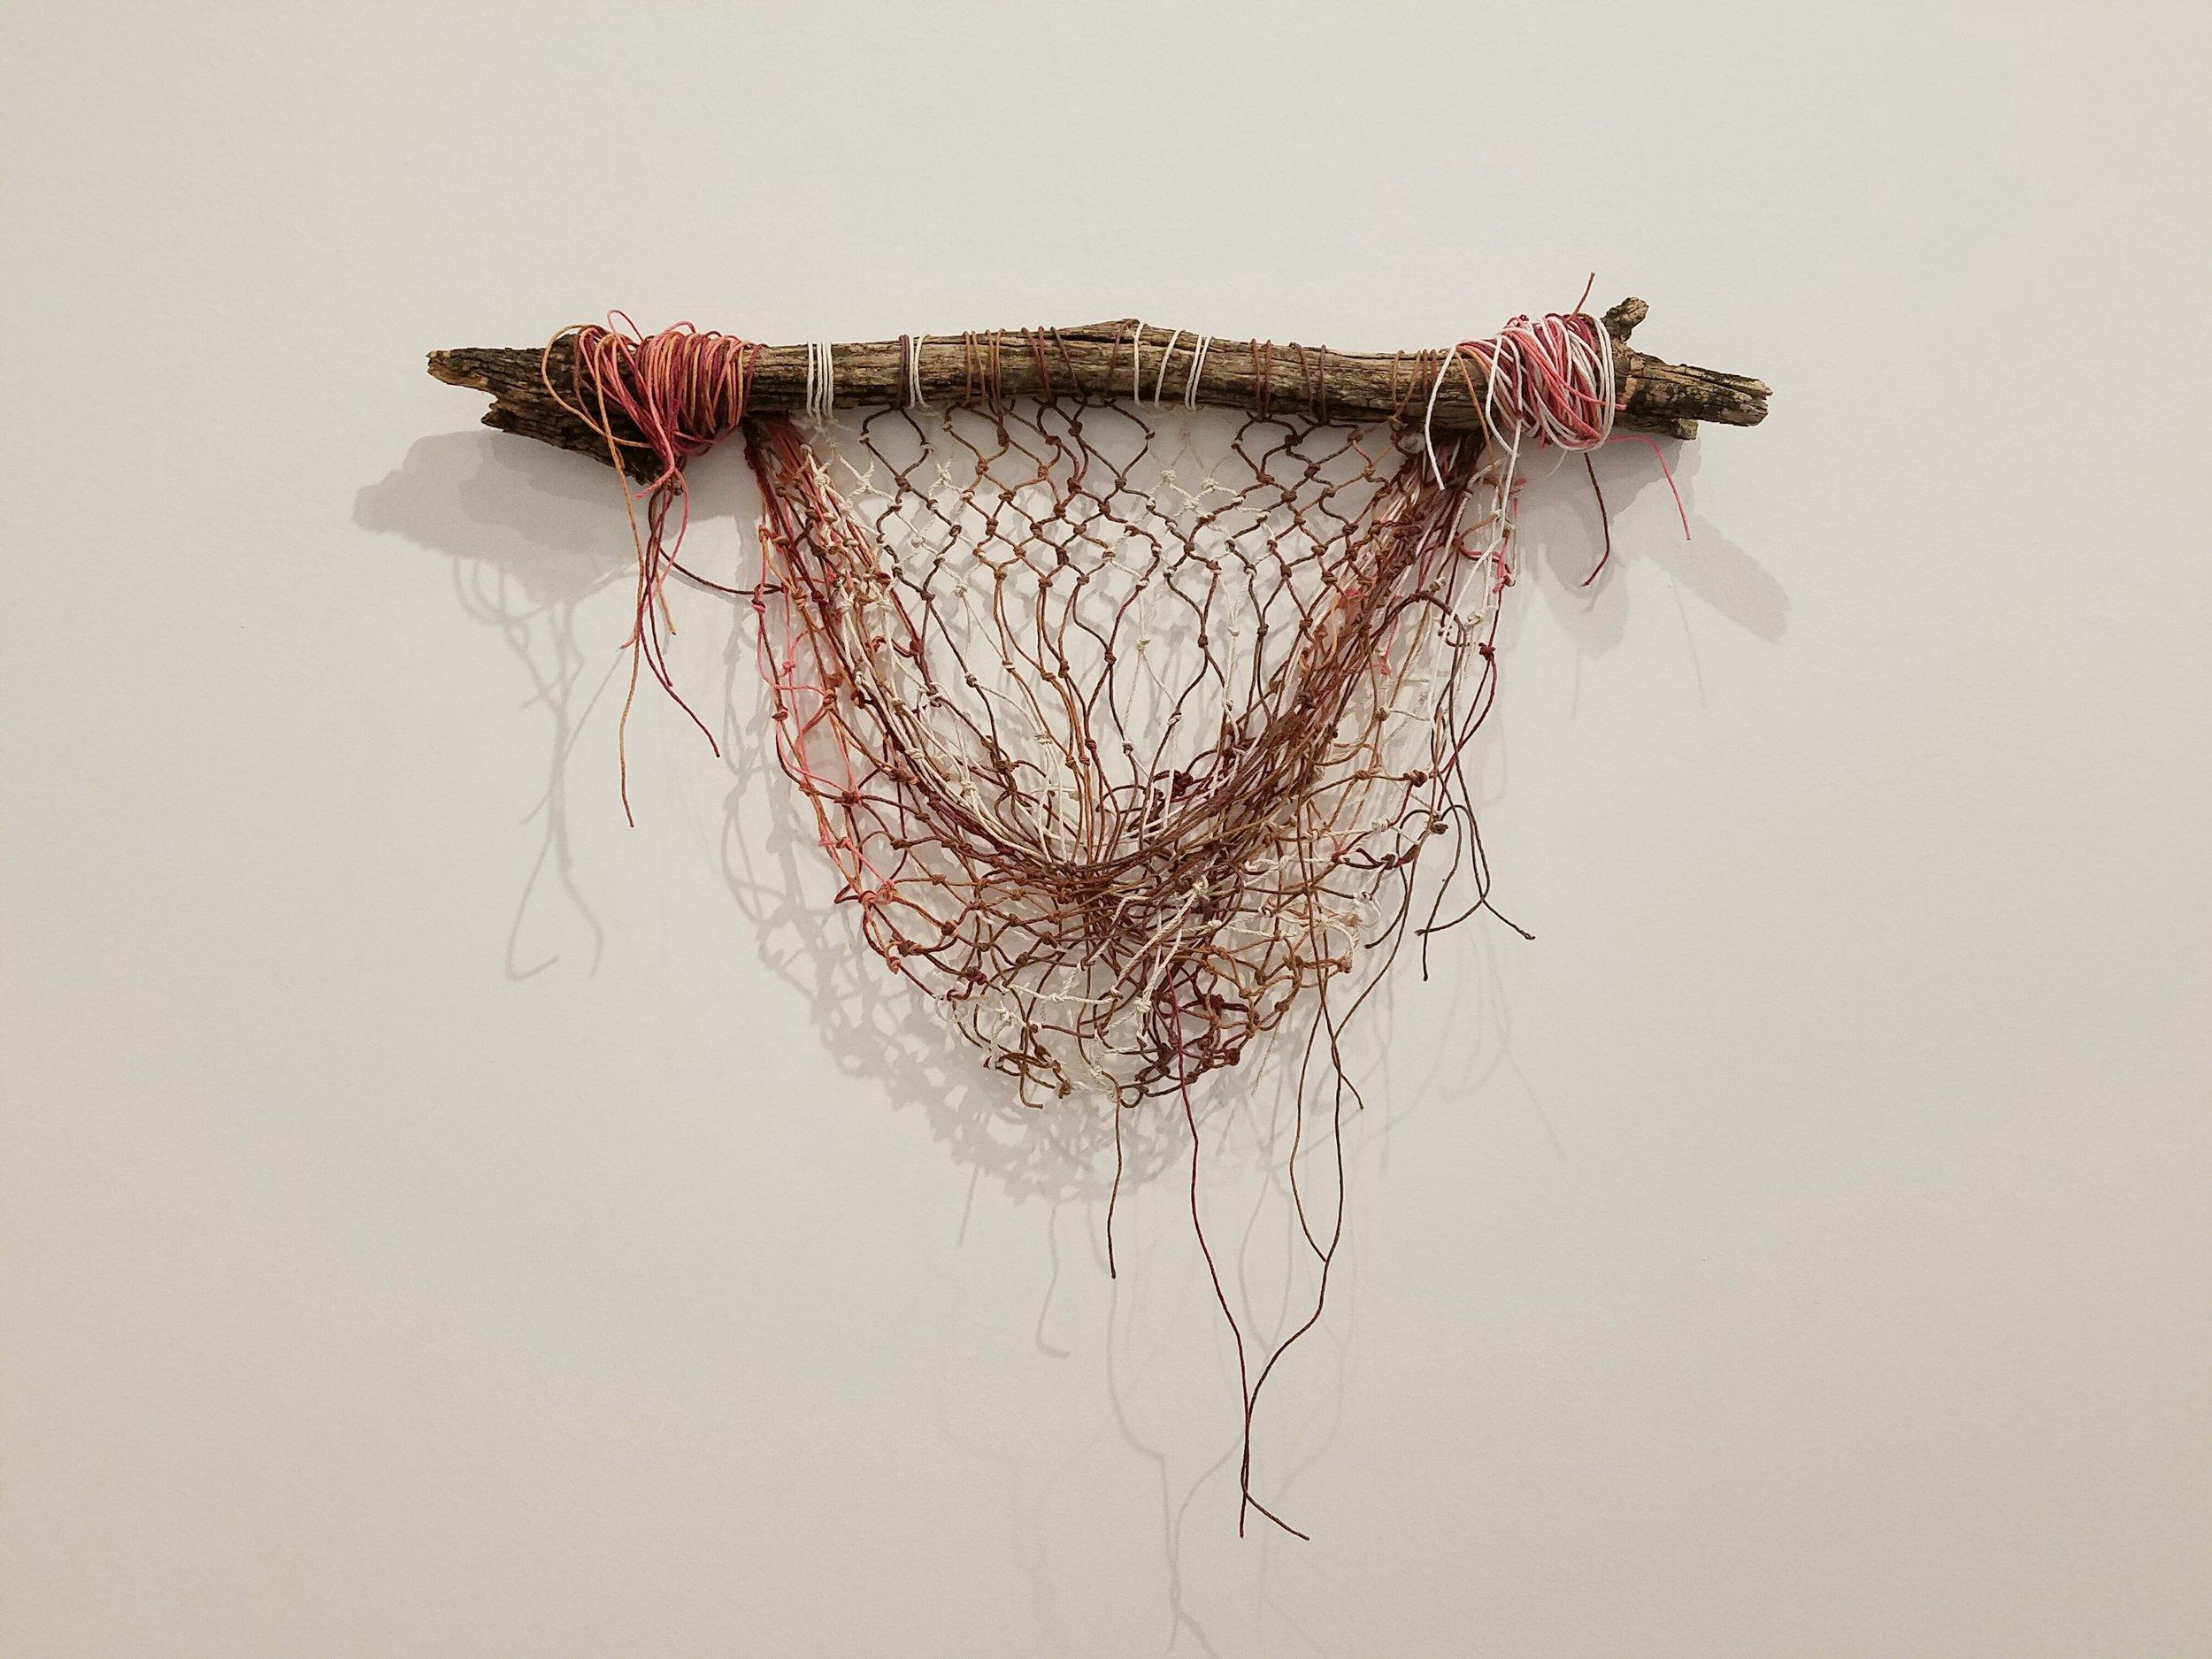 Tara Batiste,  Untitled , 2016. Stick and hemp cord. 12 x 20 inches.